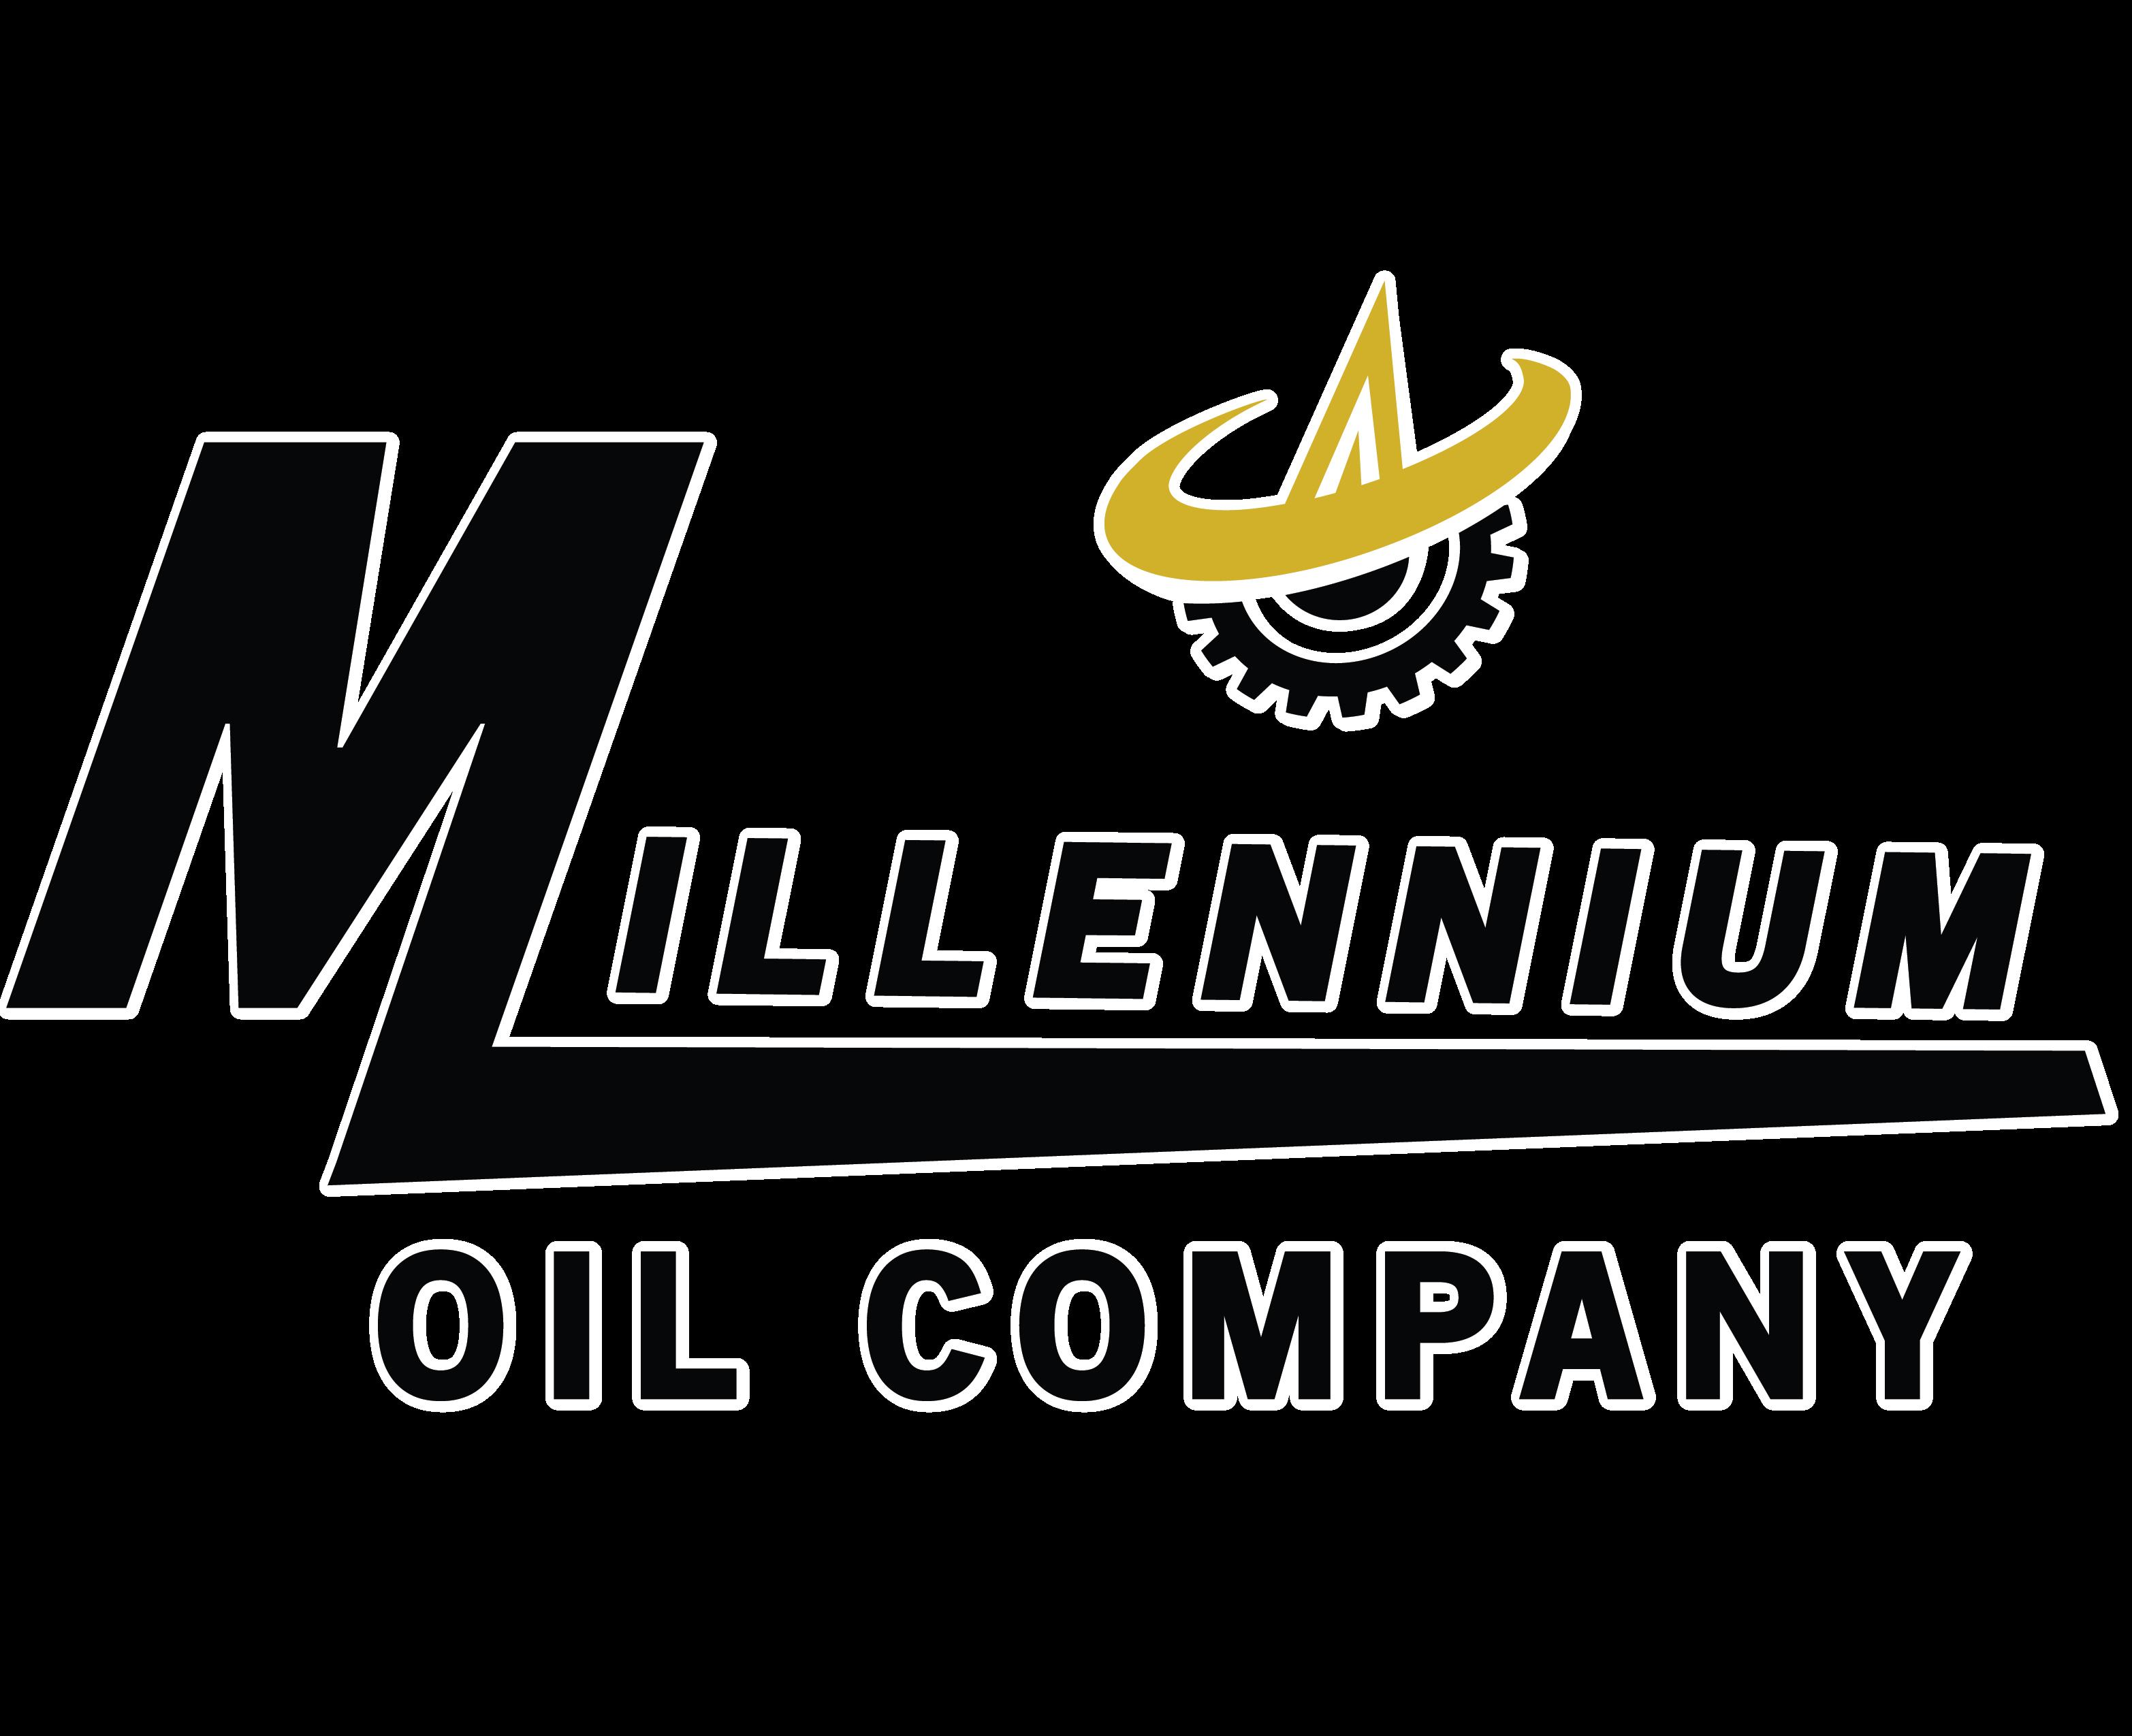 Millennium Oil Company